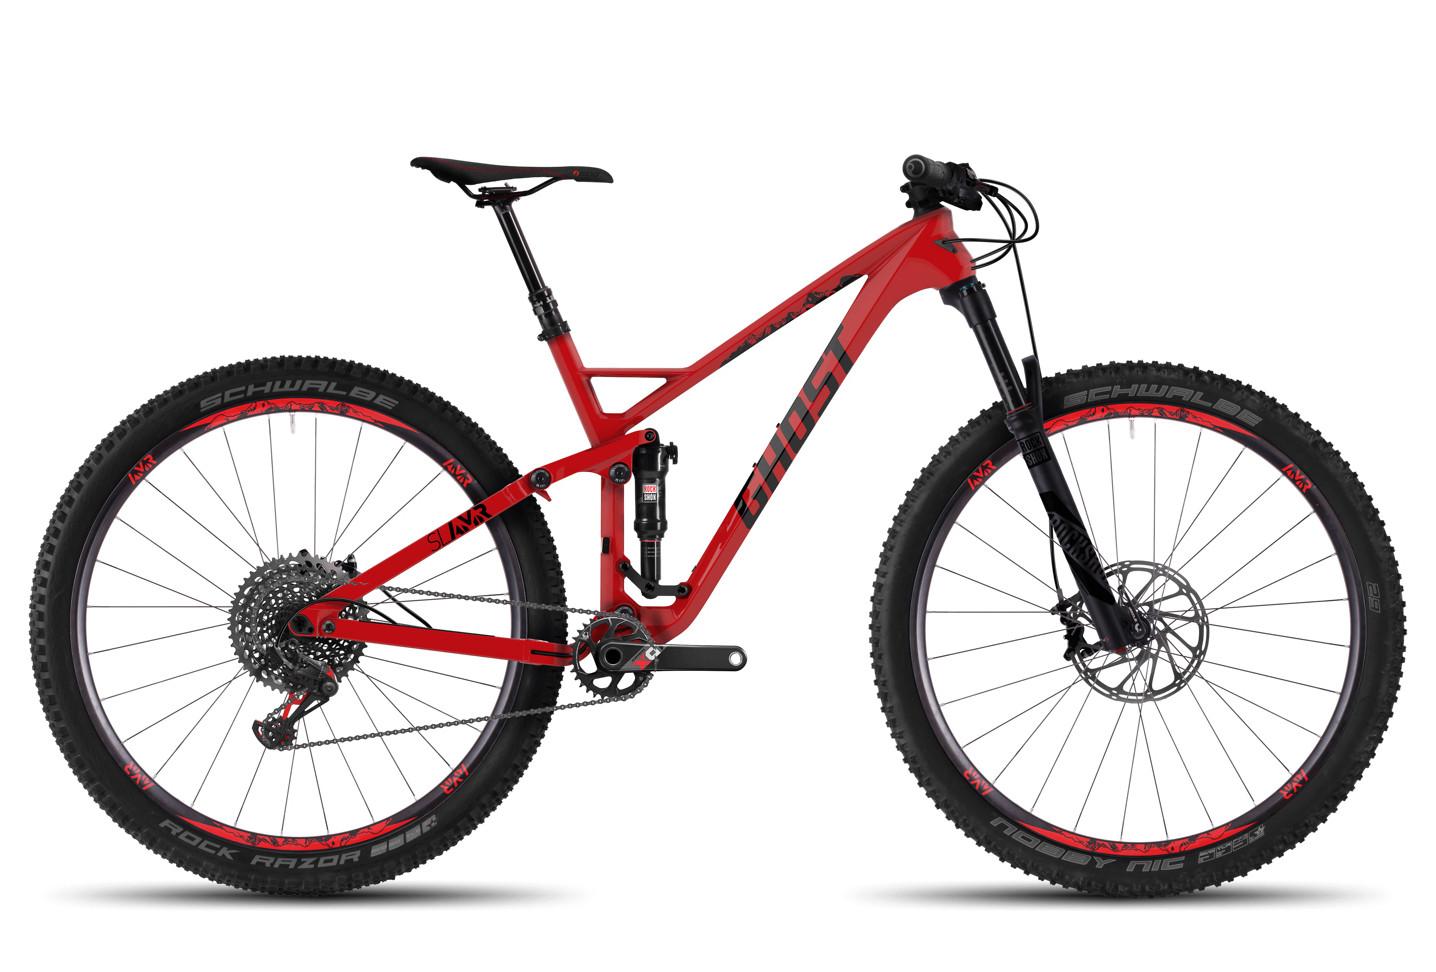 2017 ghost sl amr 10 lc bike reviews comparisons specs. Black Bedroom Furniture Sets. Home Design Ideas